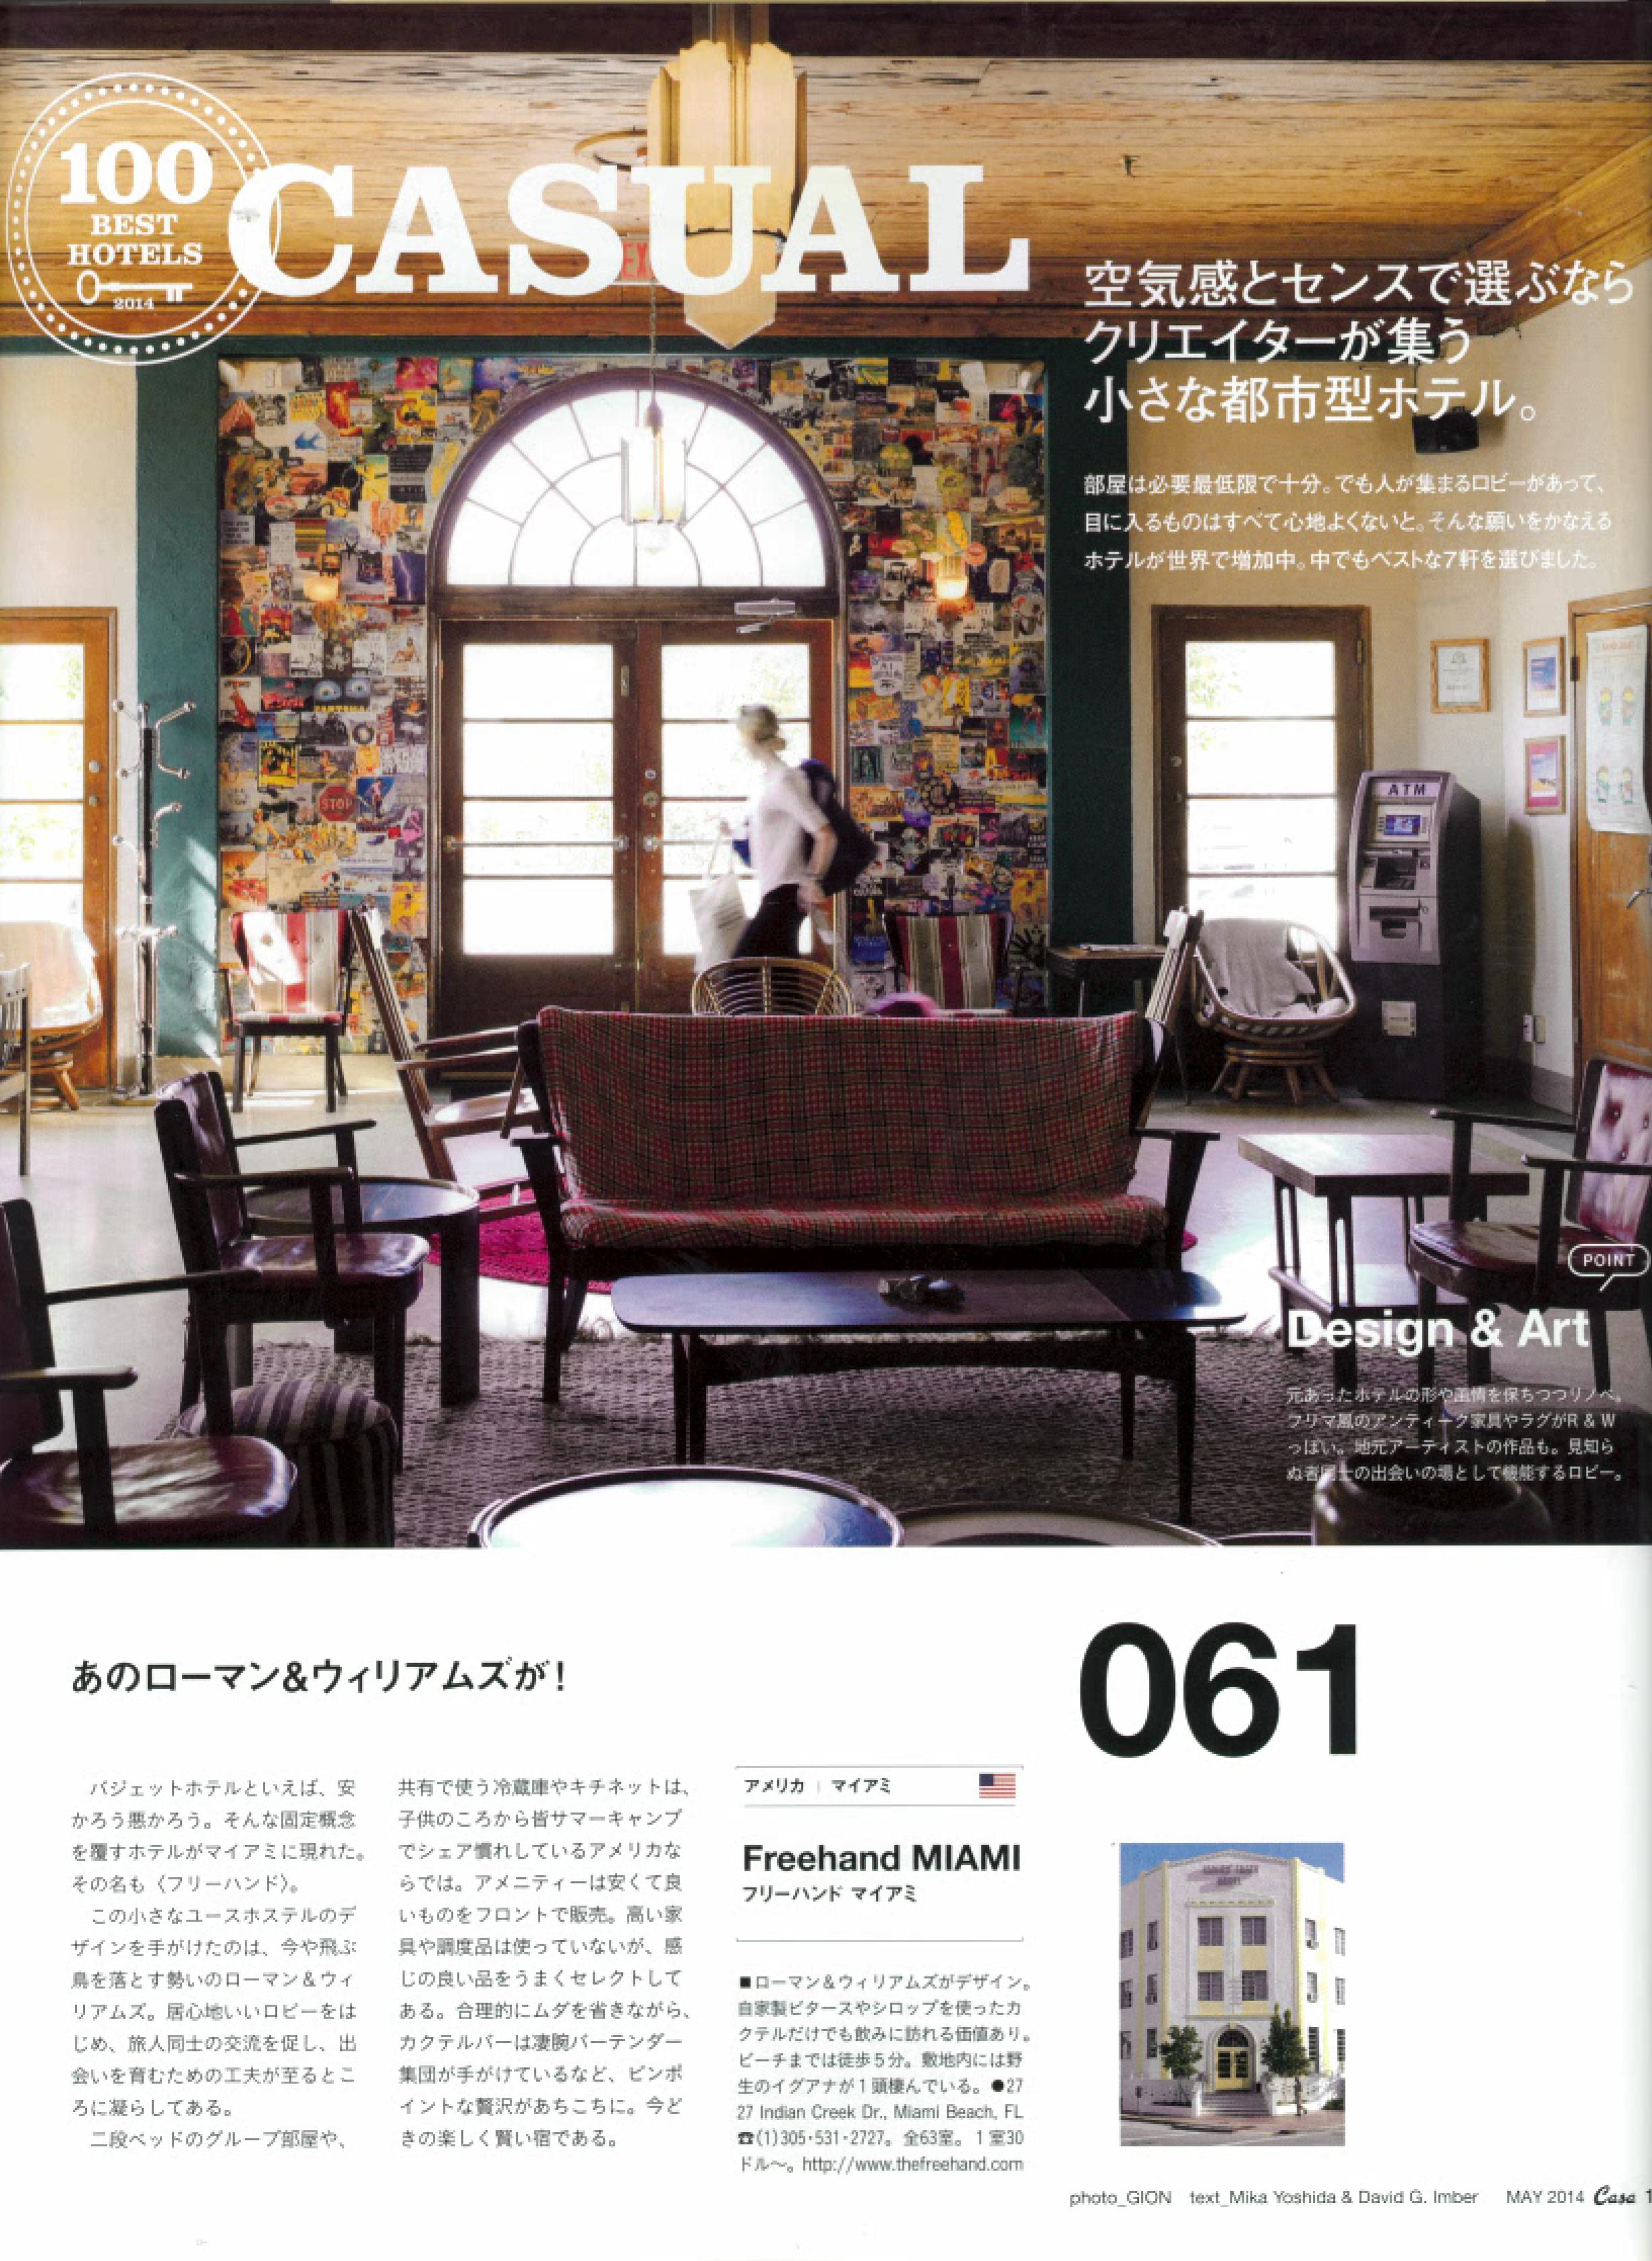 FREEHAND Casa Brutus 5.1.14_Page 1.jpg